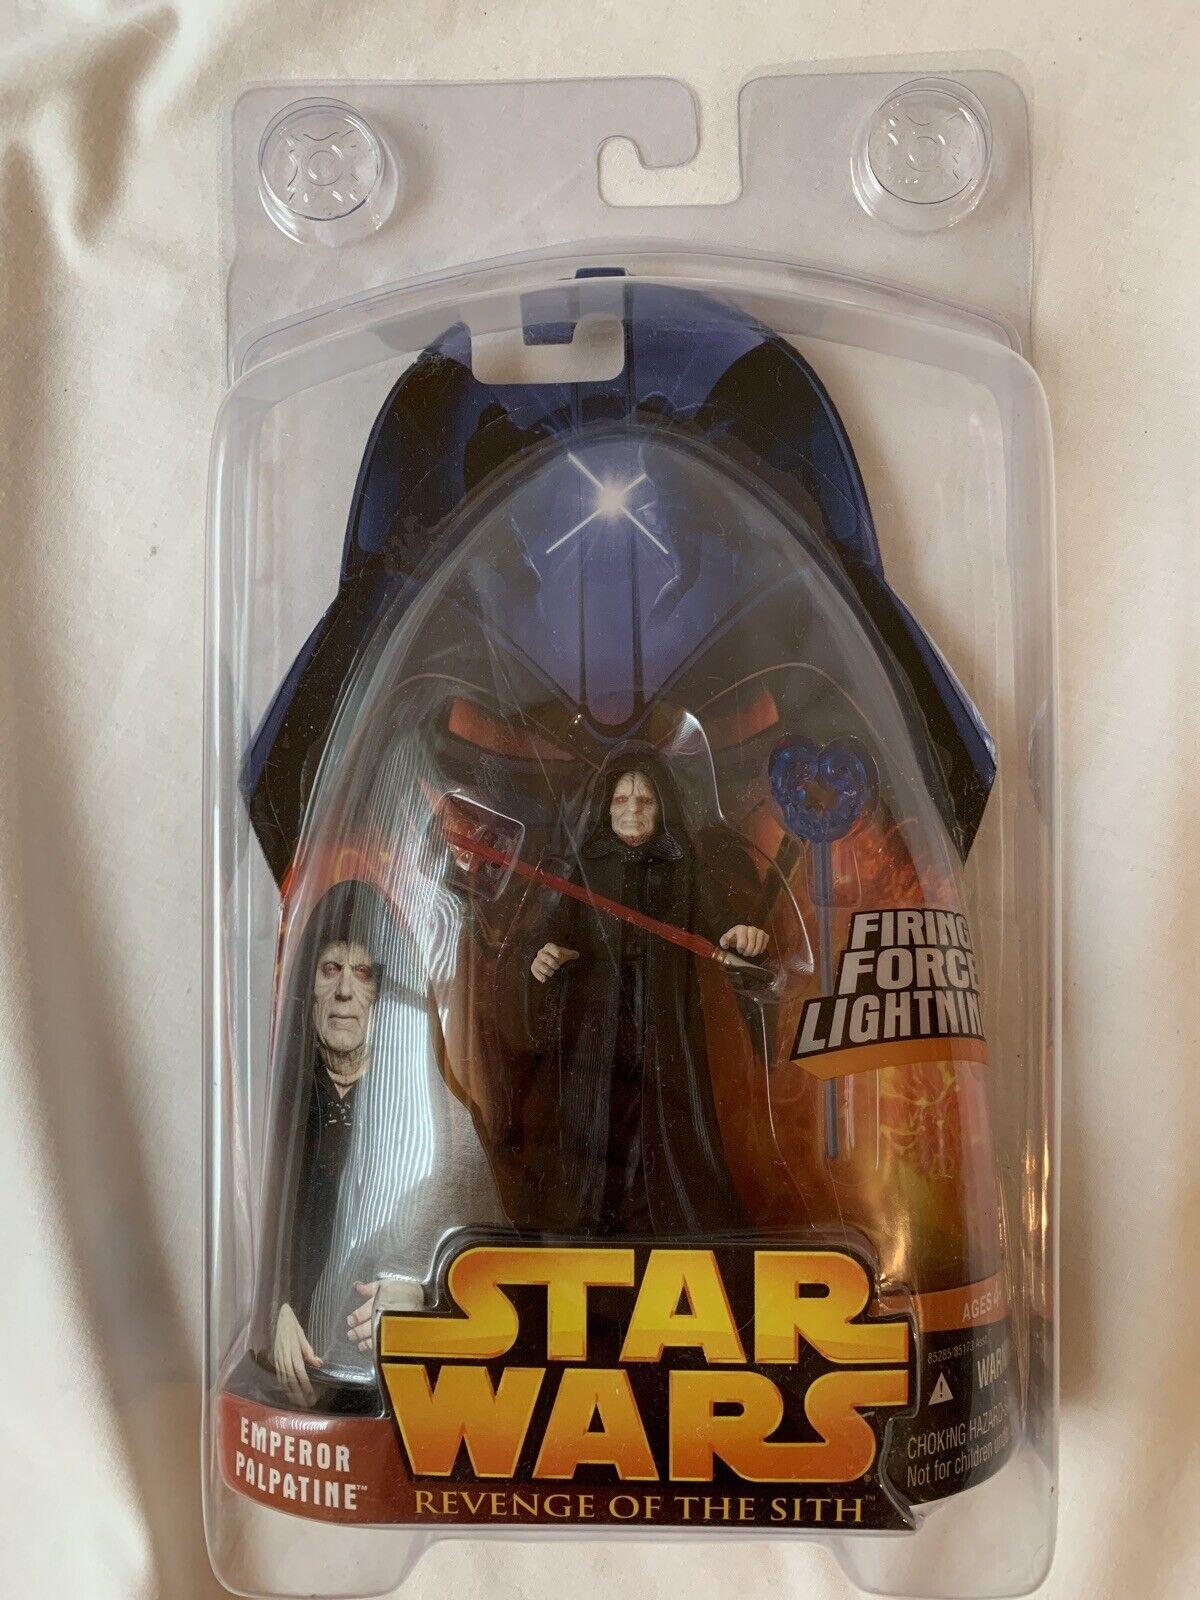 Star Wars Episode III 3 Revenge of the Sith EMPEROR PALPATINE Firing Force Lightning Figure #12 Hasbro 85285